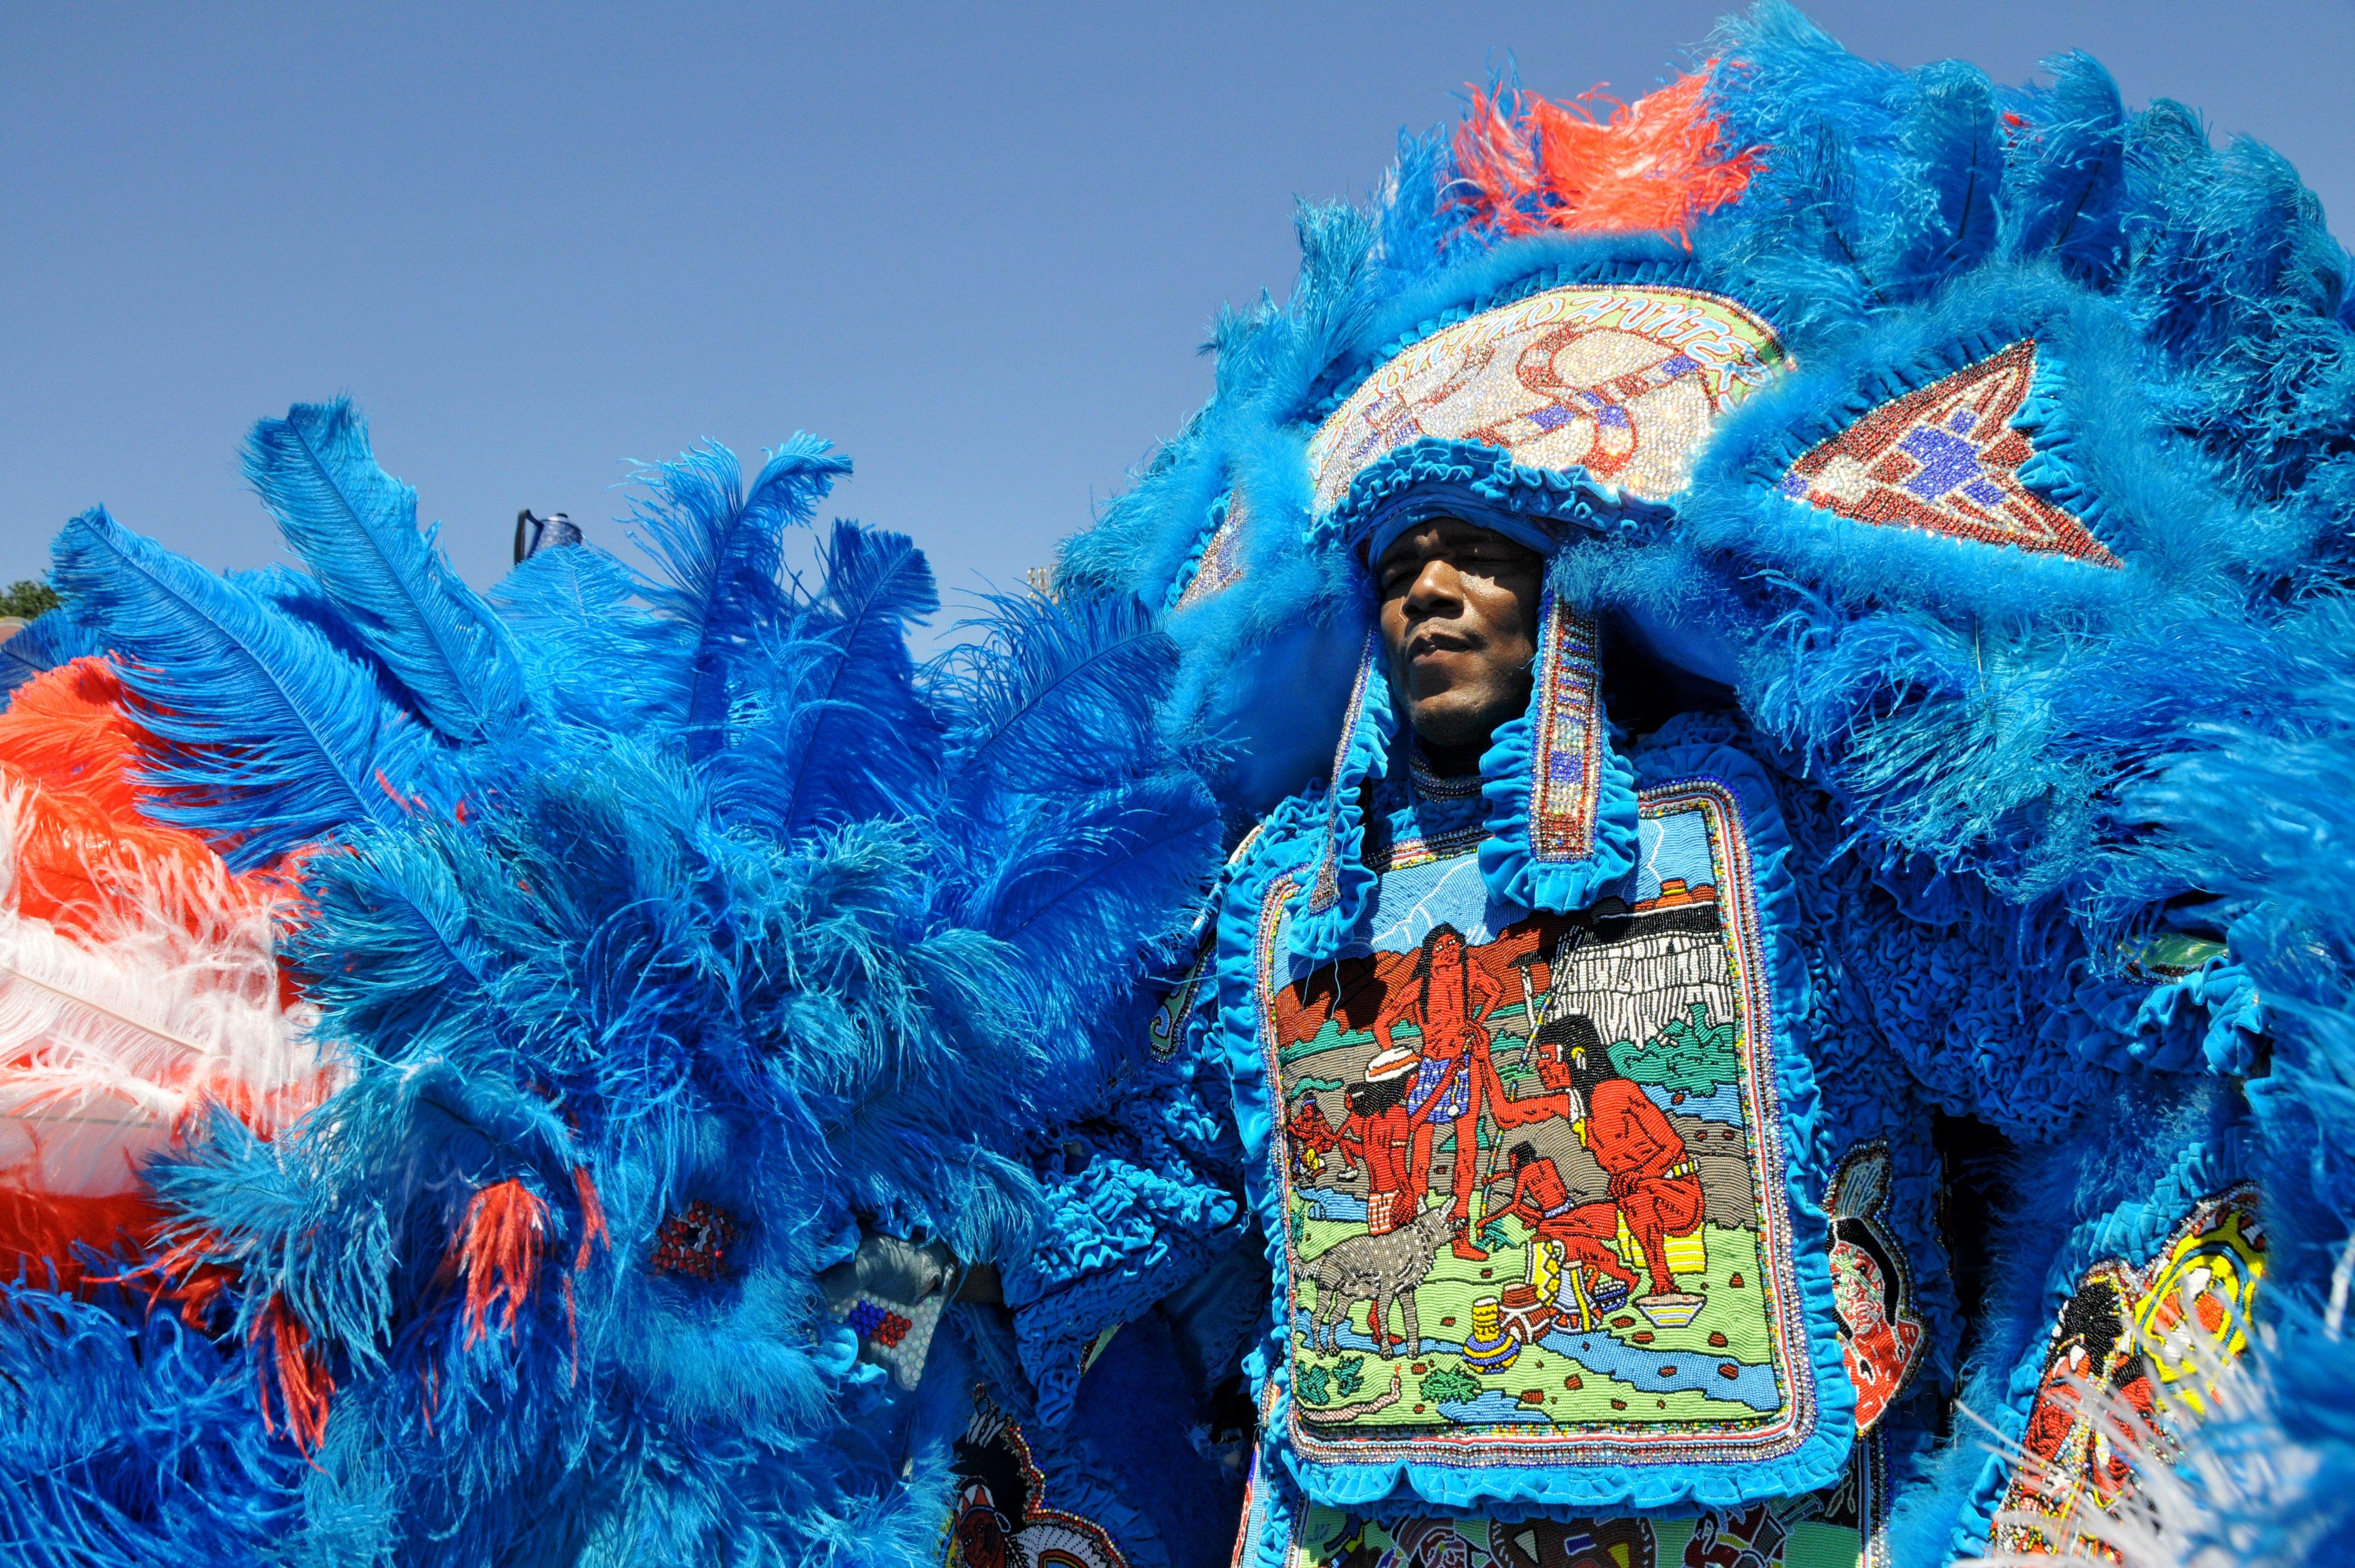 El espectacular traje de un Big Chief en Mardi Gras. Foto: Tulane Public Relations